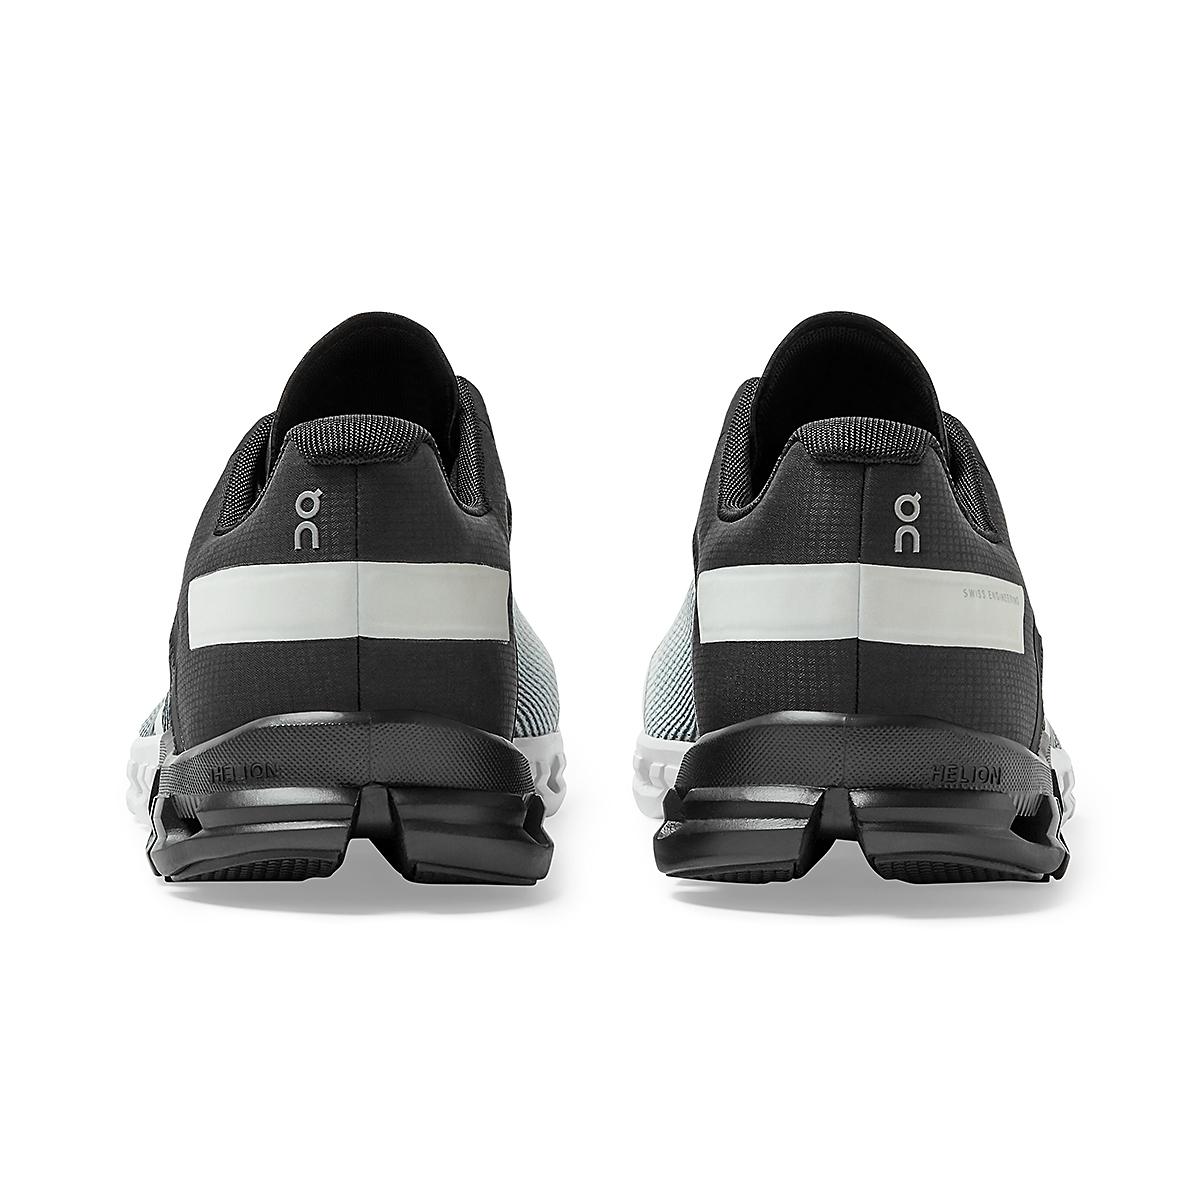 Men's On Cloudflow 2.0 Running Shoe - Color: Black/White - Size: 9.5 - Width: Regular, Black/White, large, image 4